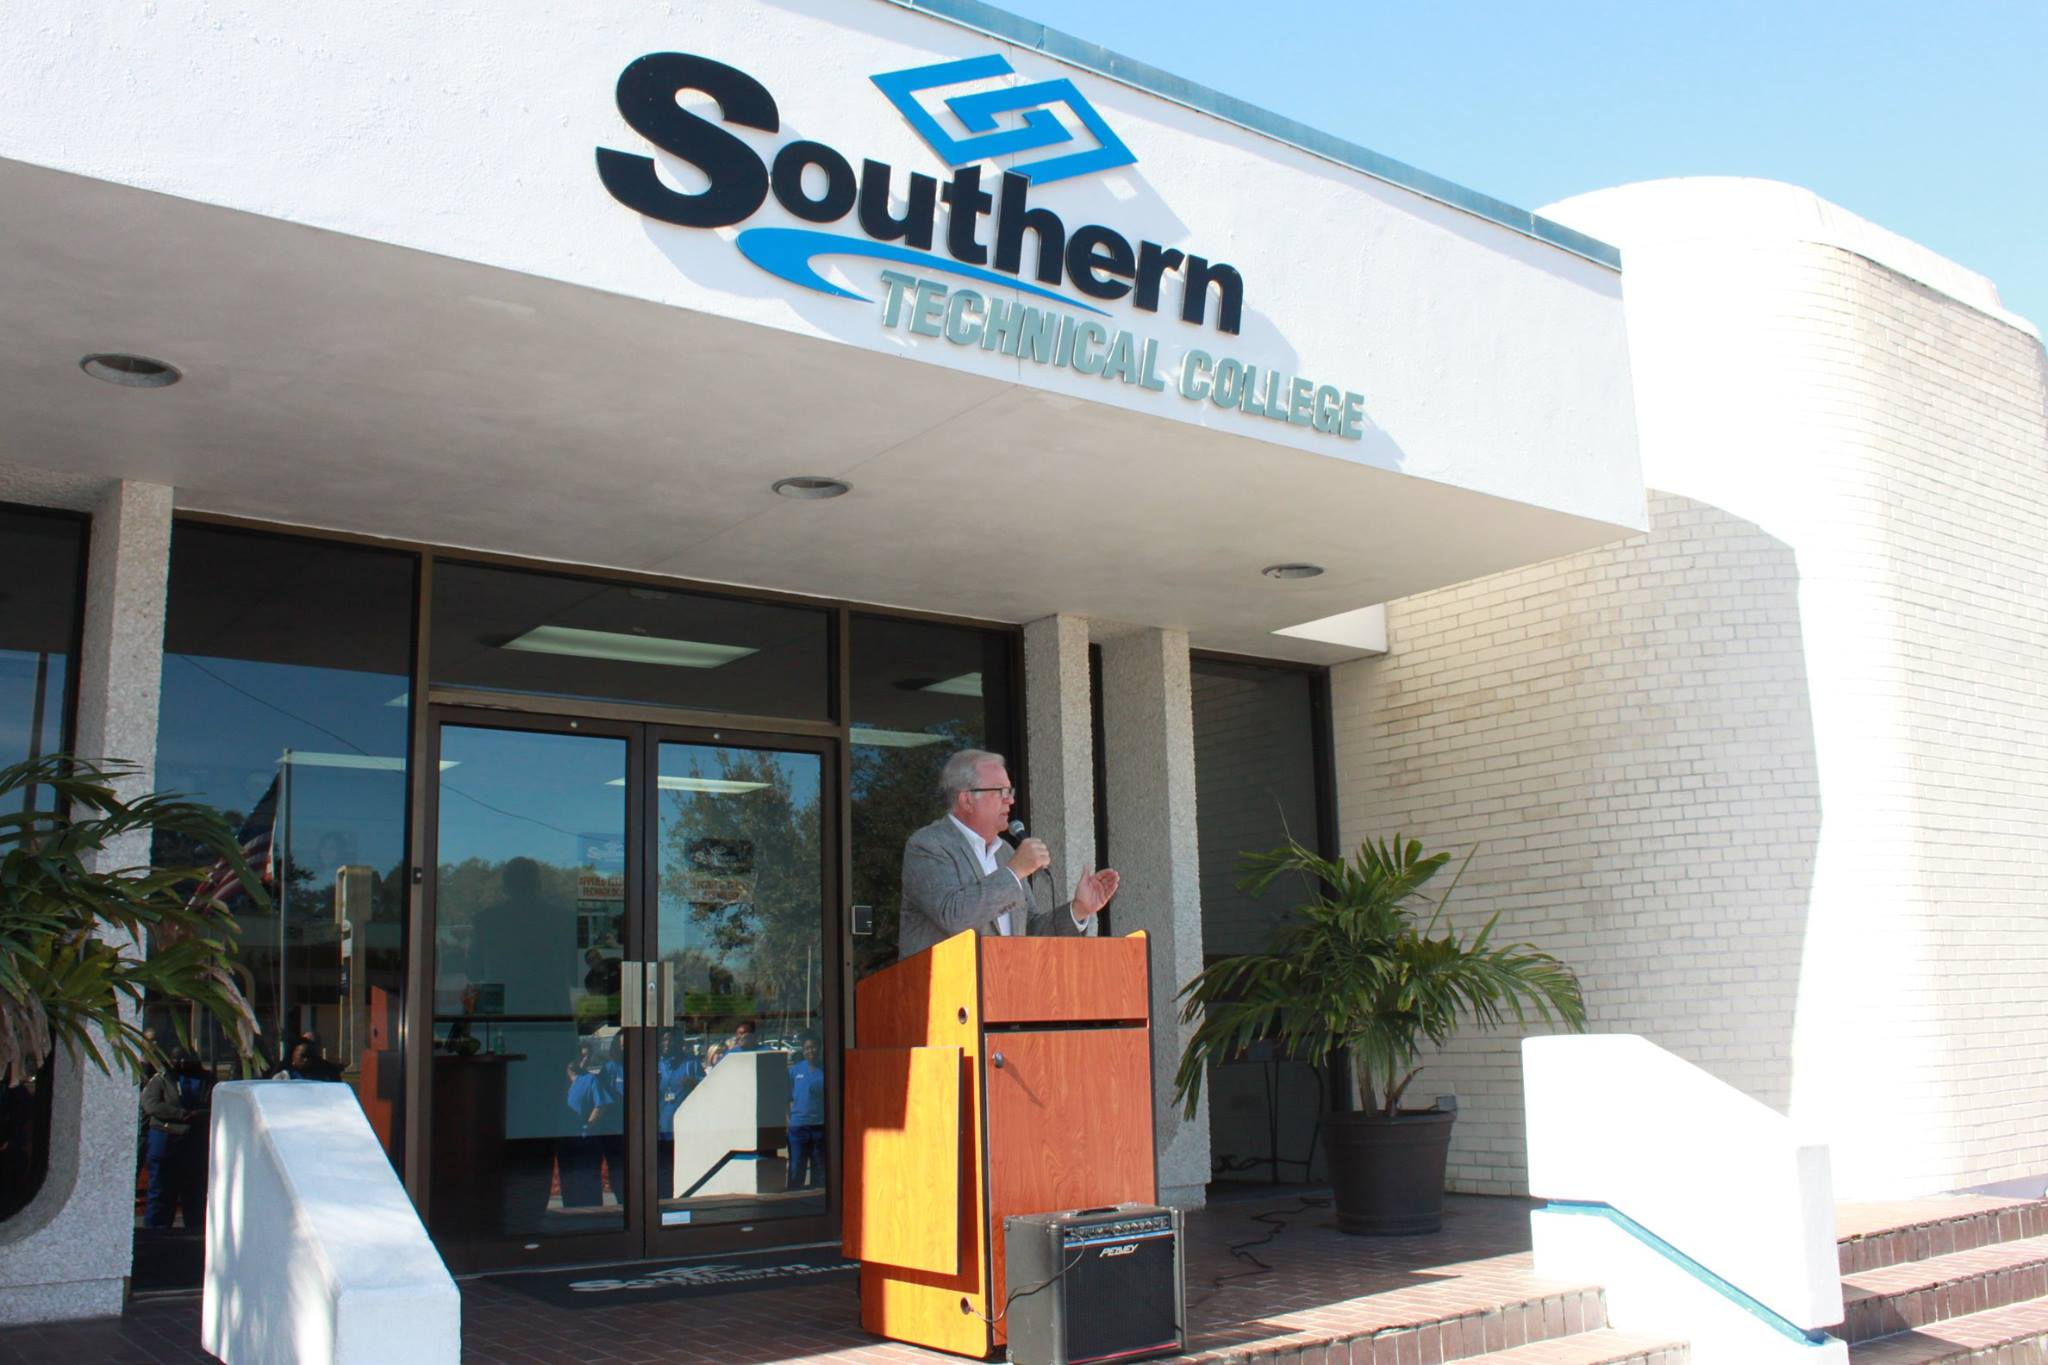 Southern Technical College Welcomes Auburndale Mayor